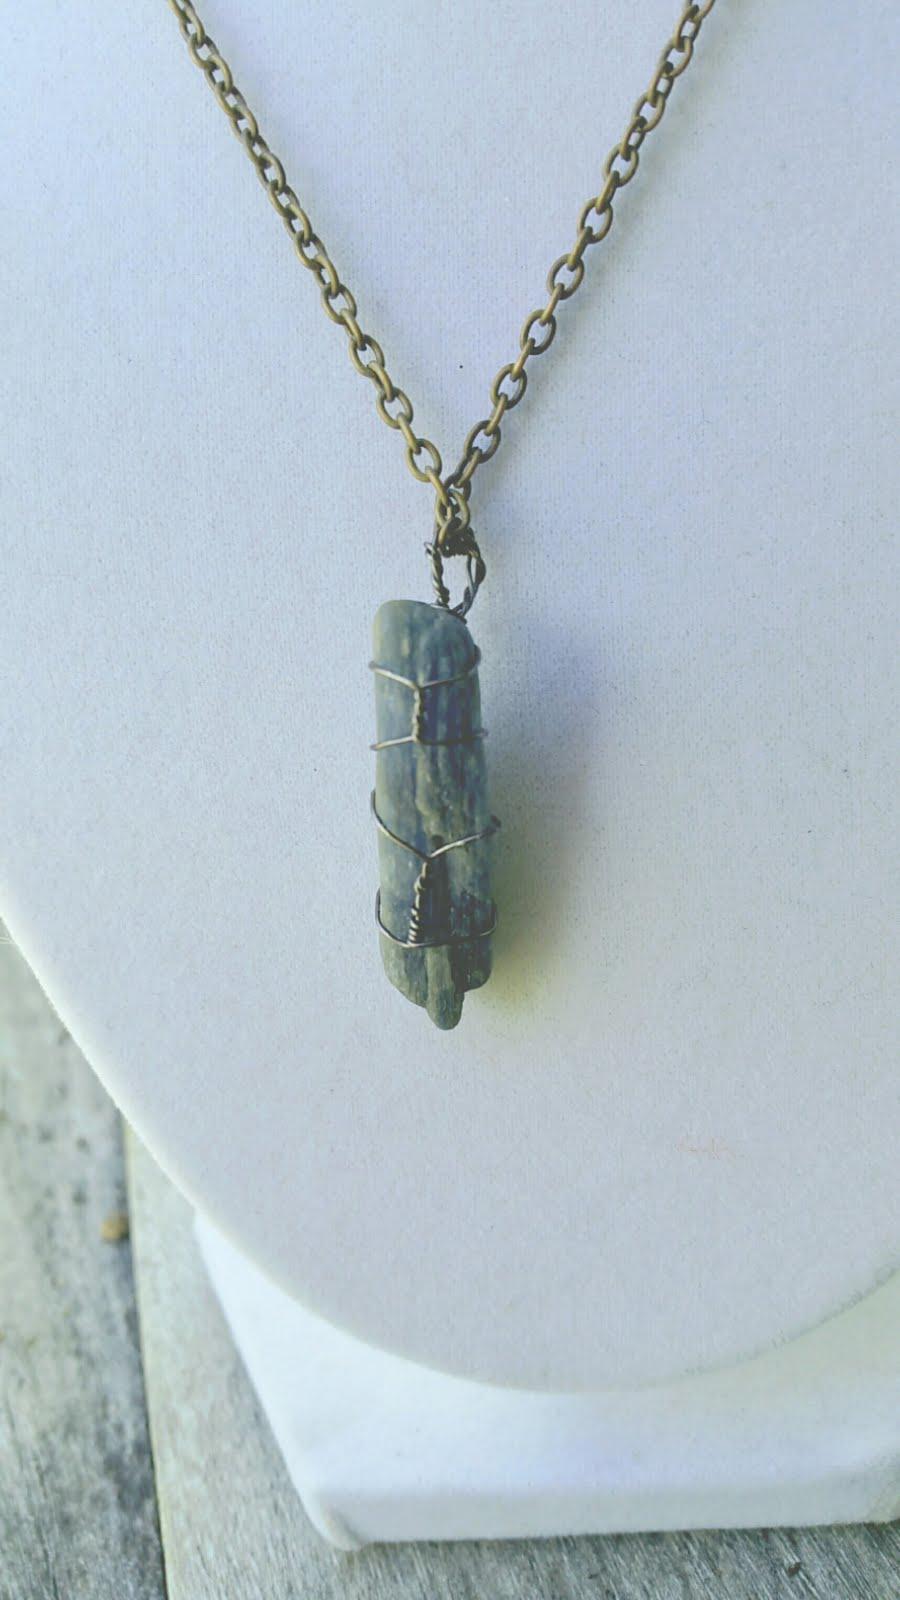 Kyanite Healing Pendant